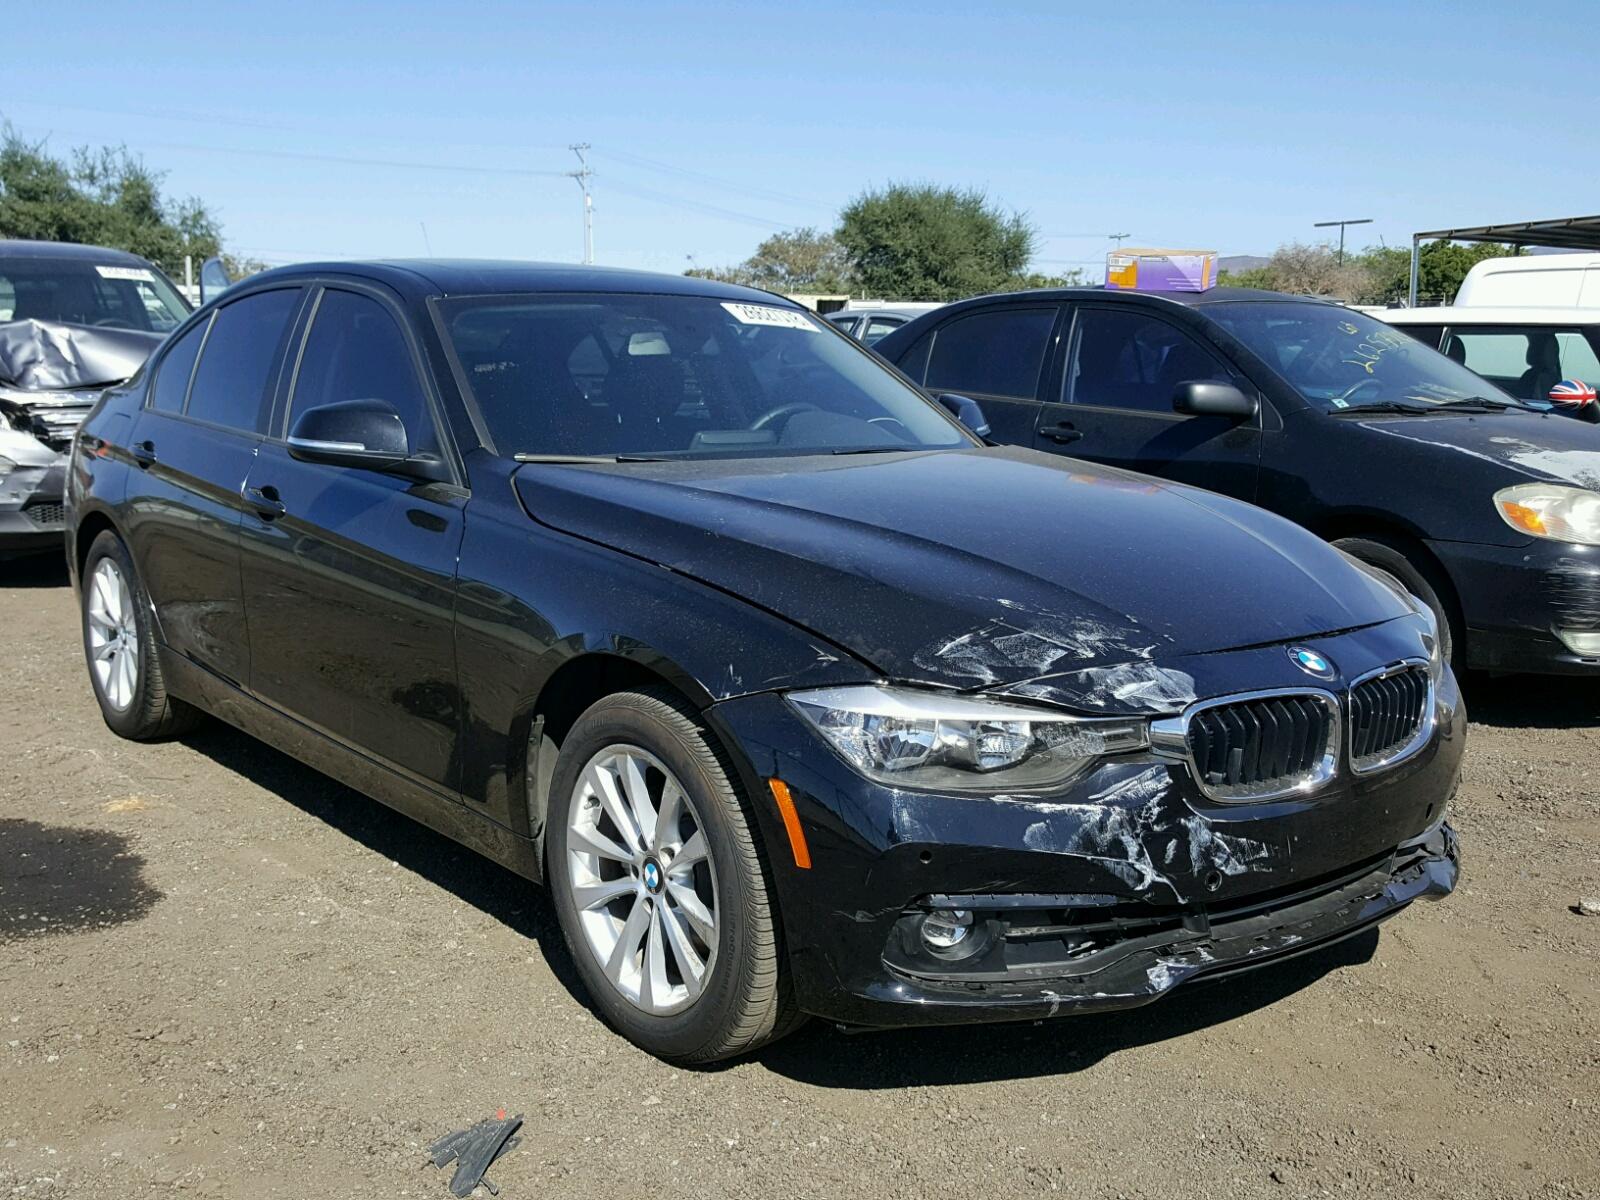 Auto Auction Ended On Vin Wba3r5c50fk371967 2015 Bmw 435